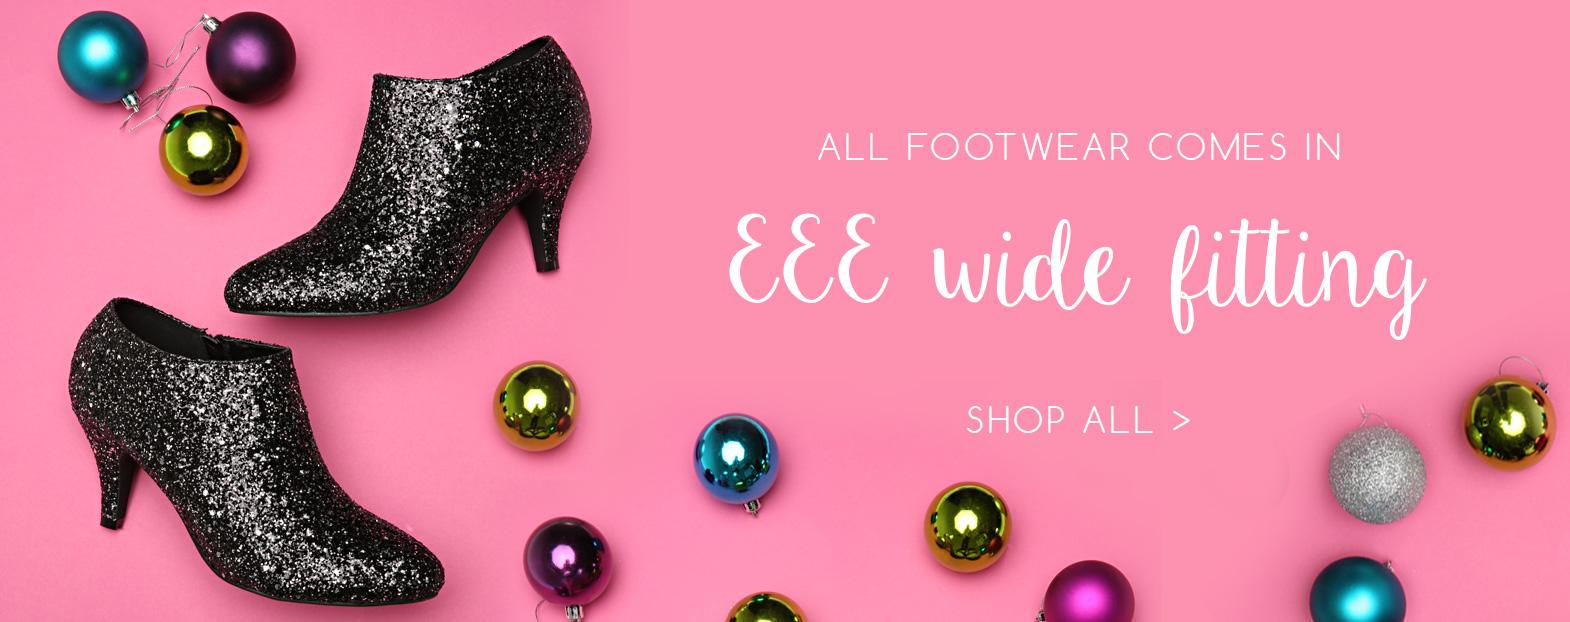 Shop All EEE Fitting Footwear >